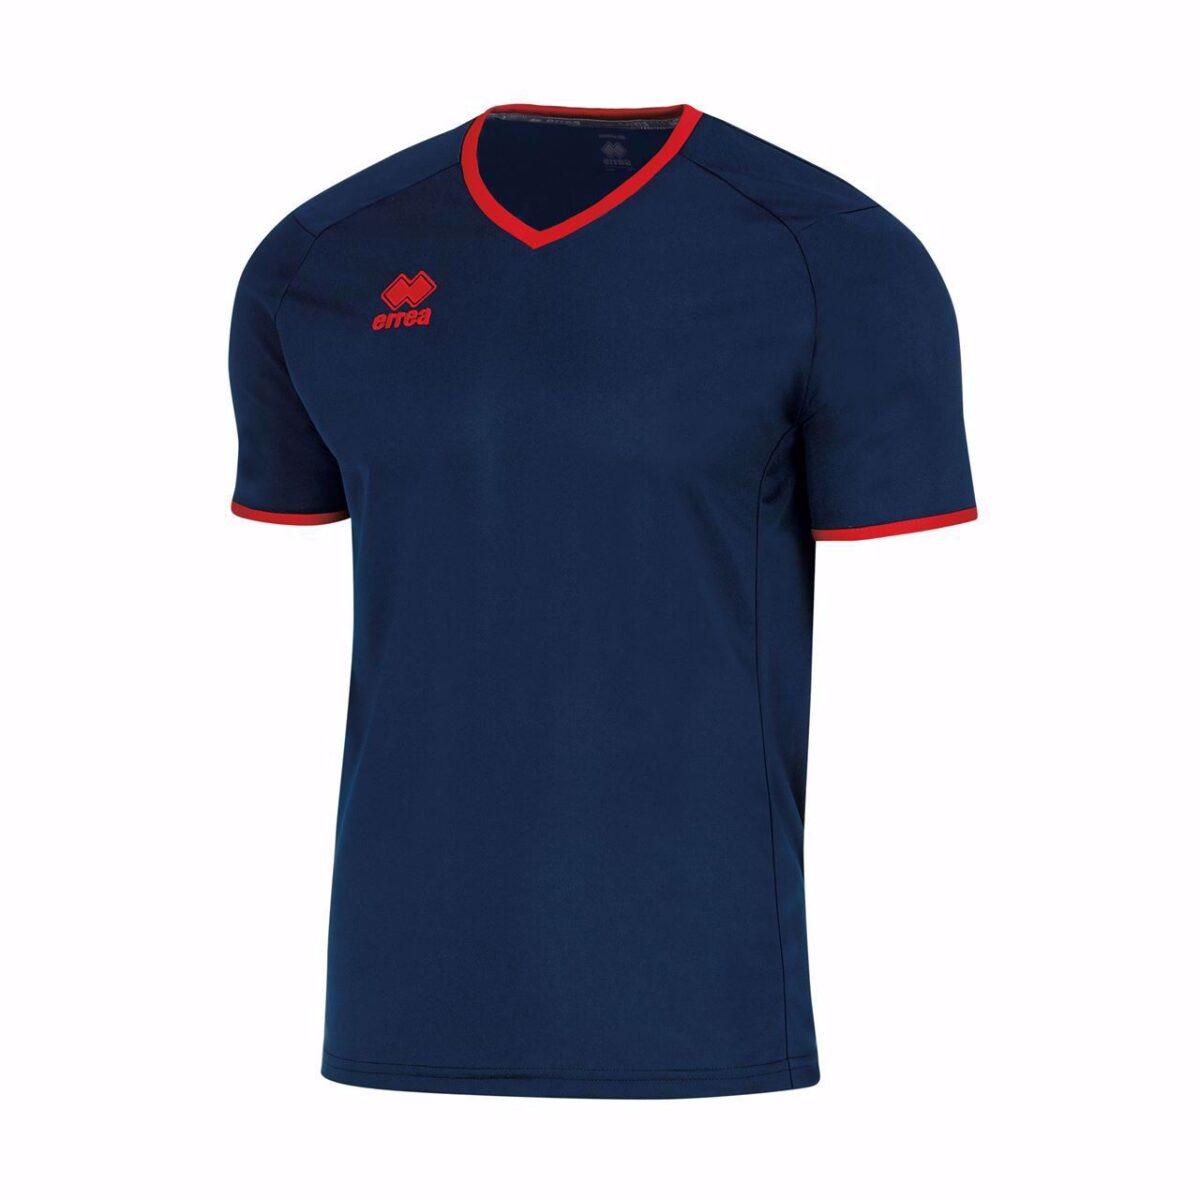 Errea Lennox Shirt S/S - Junior